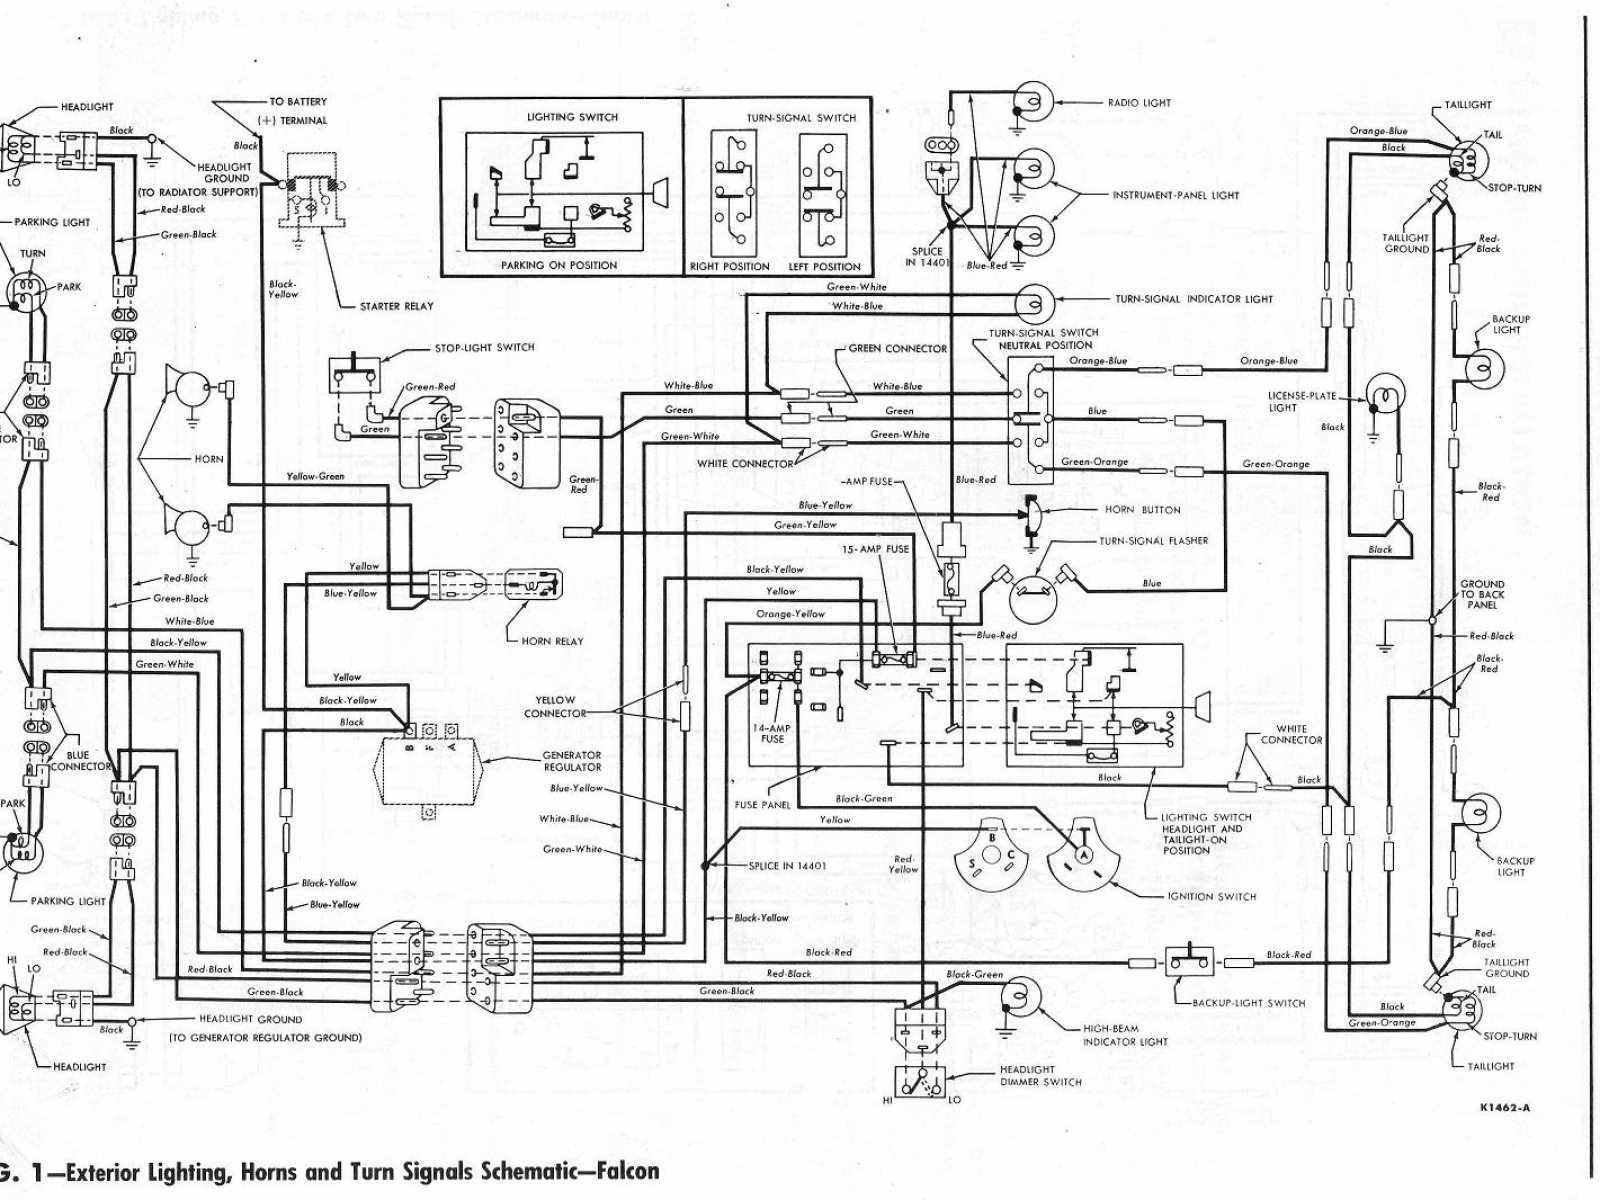 small resolution of studebaker wiring harness wiring diagram expert 1948 studebaker wiring harness studebaker wiring harness